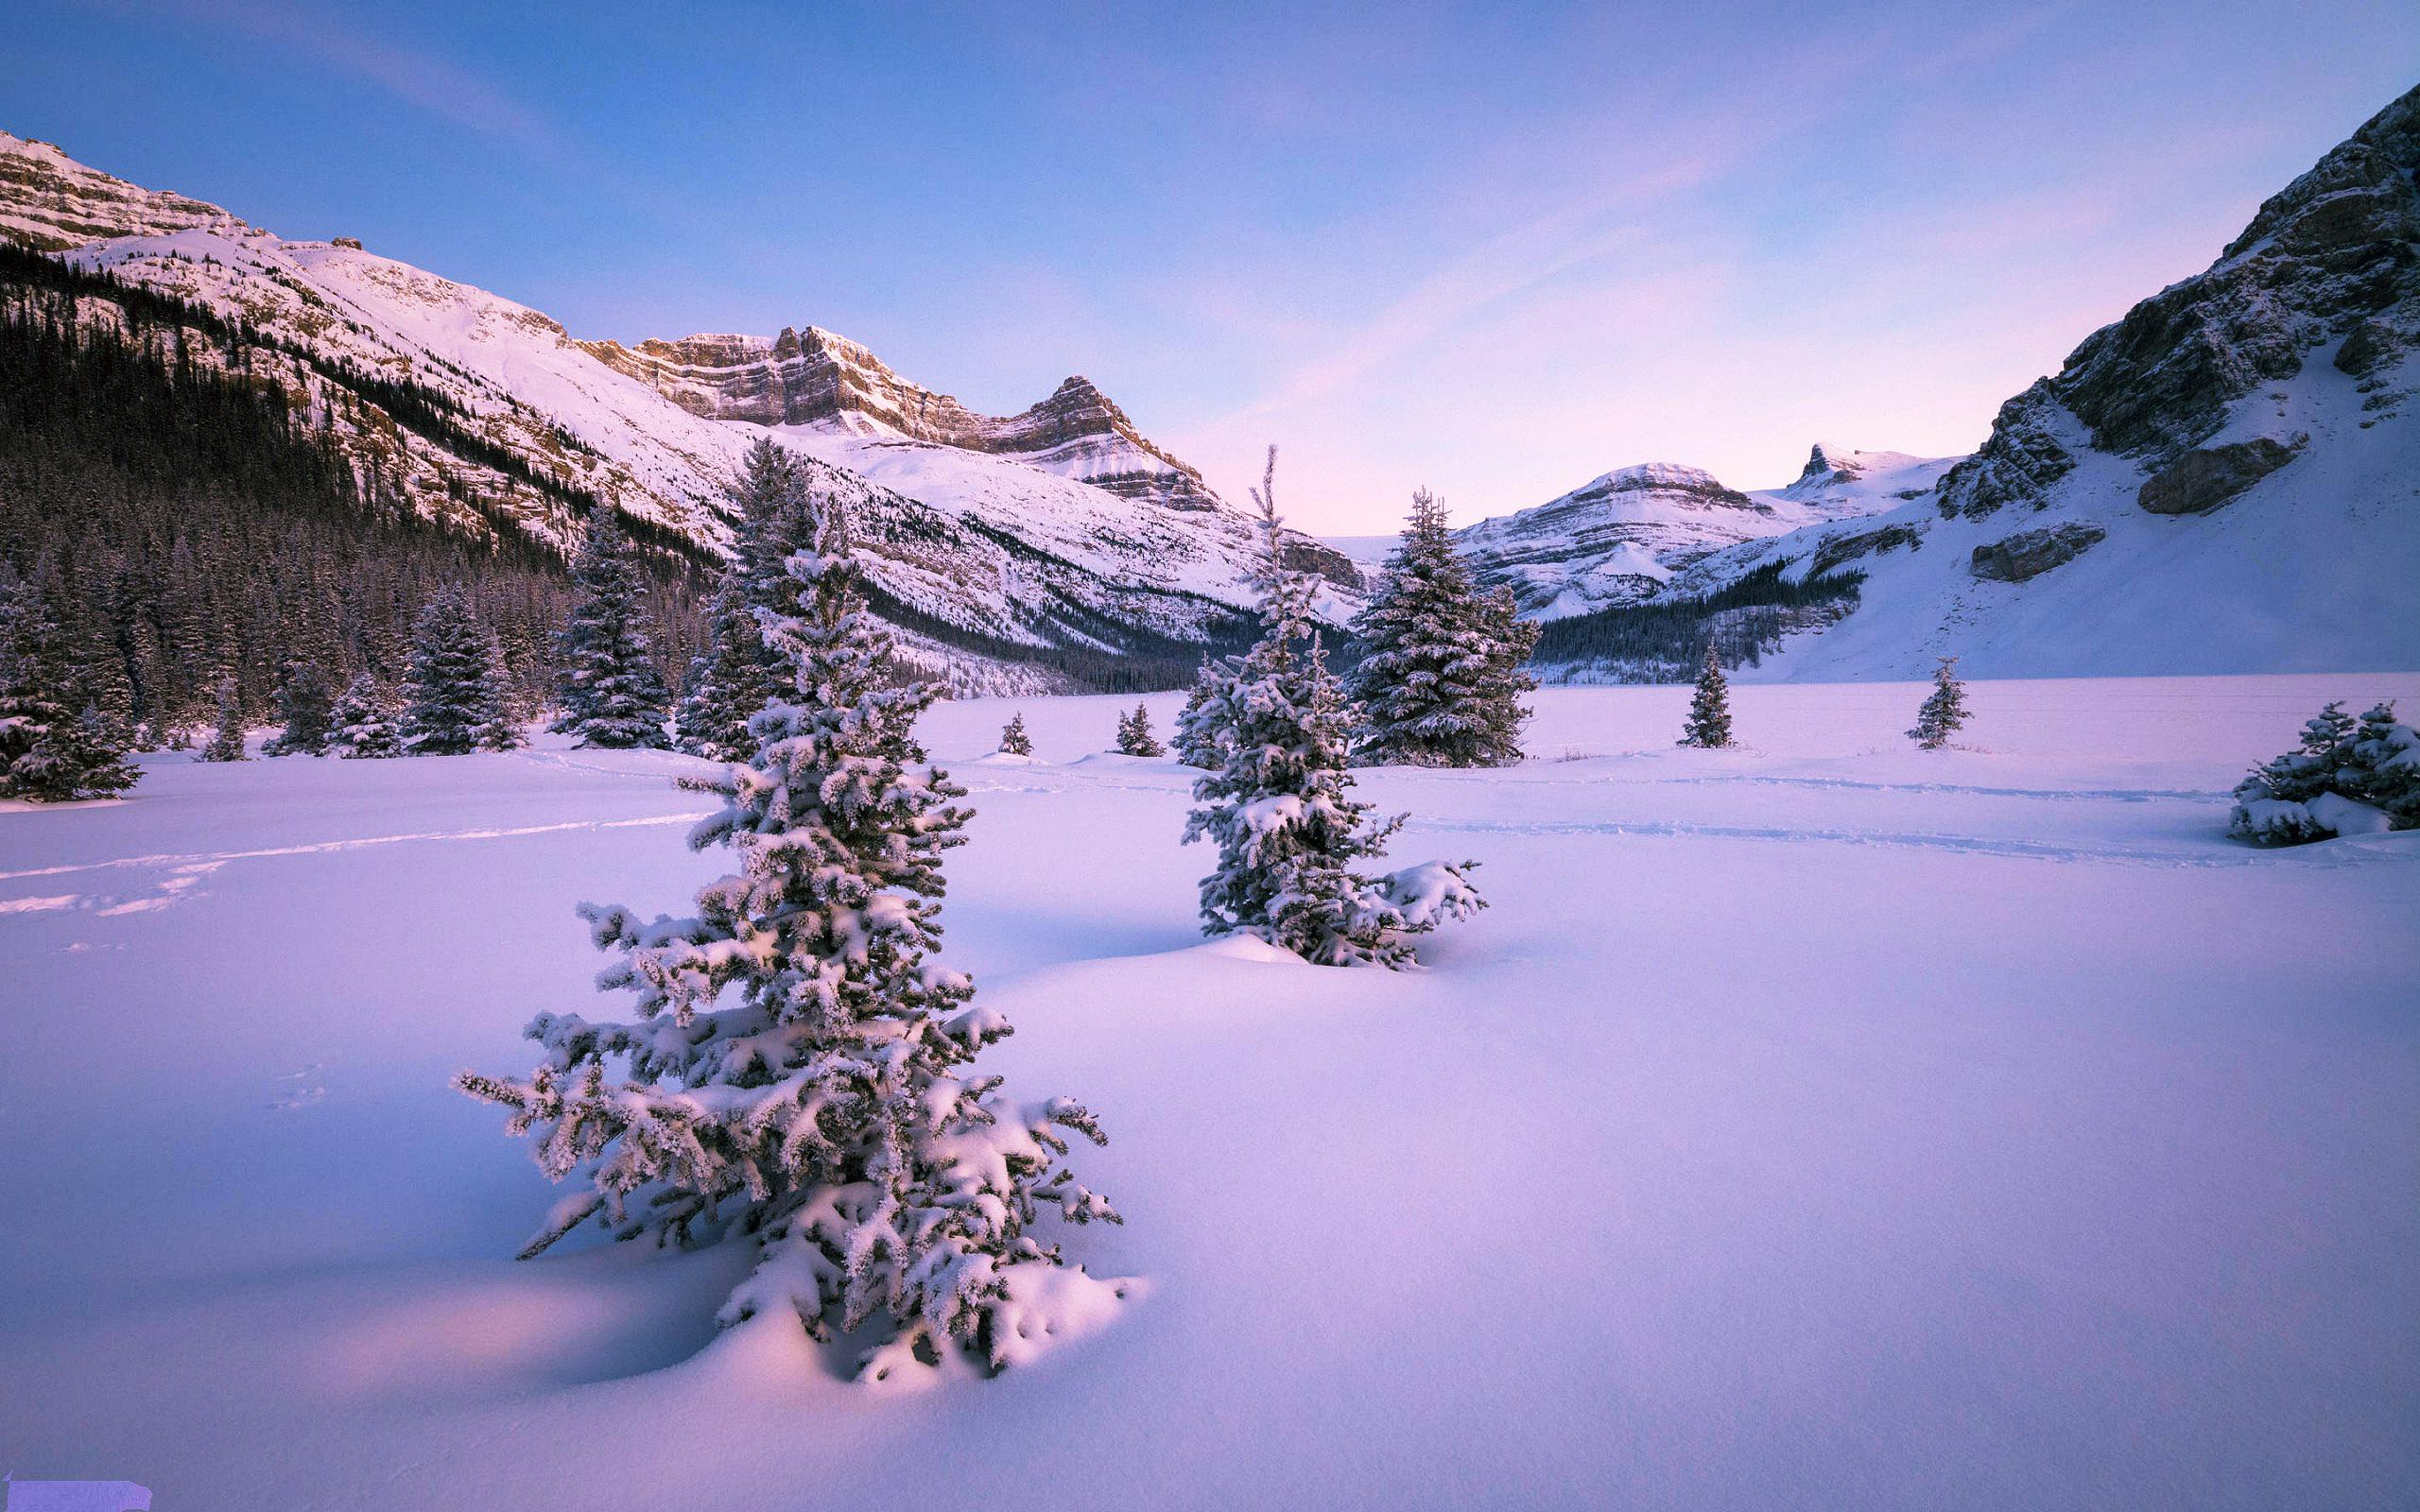 зима, снег, горы, долина, холод, hd обои